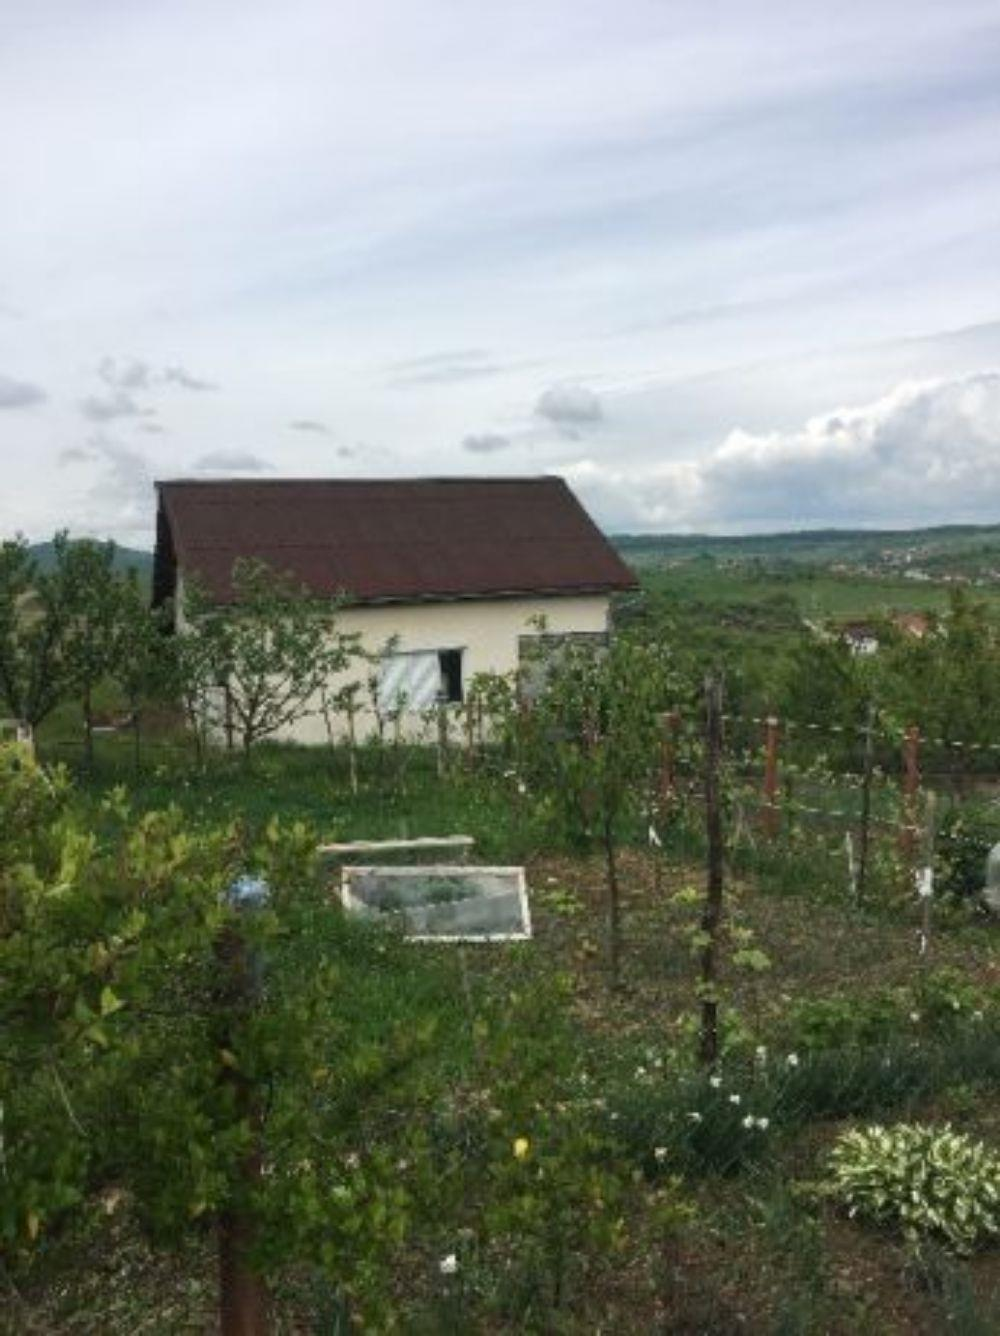 Vand/schimb casa cu teren drumul sigmirului - imagine 4